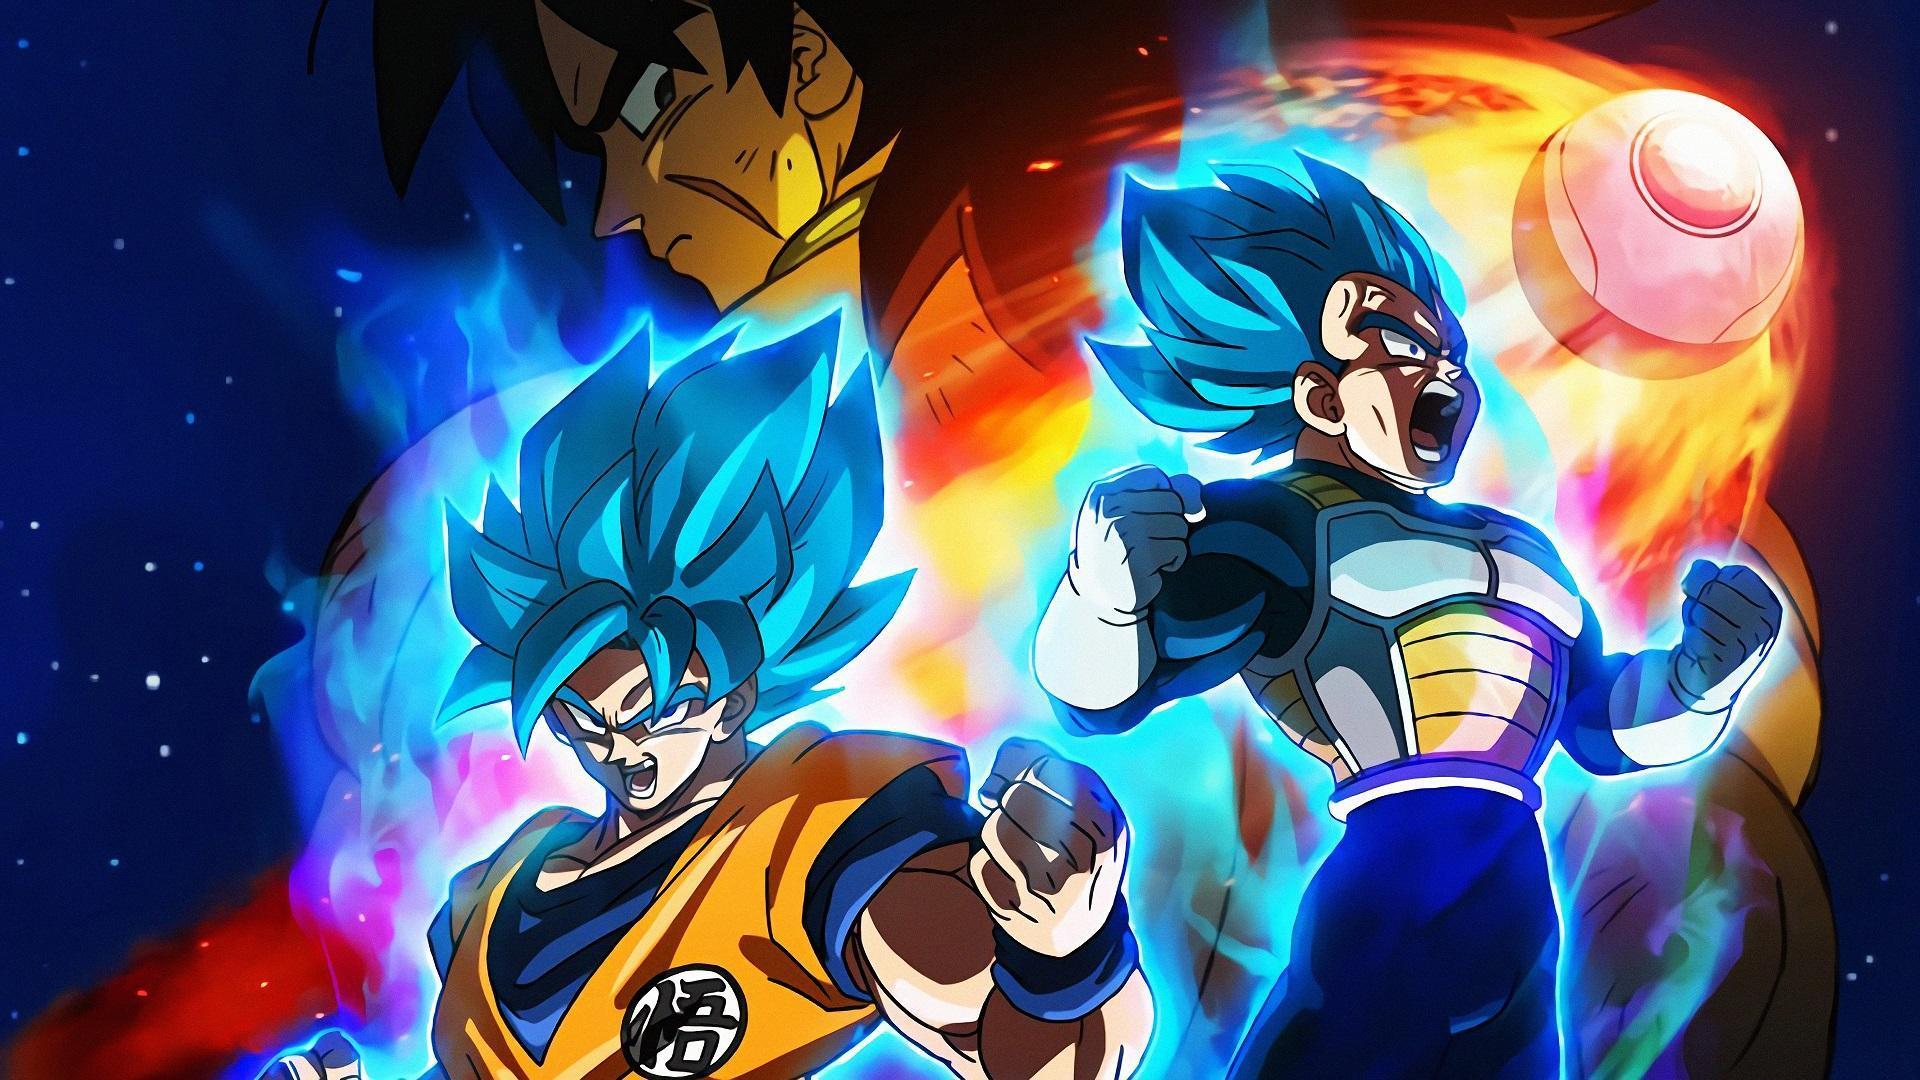 Goku Fond d'écran HD: Goku DragonBall fond d'écran pour Android - Téléchargez l'APK